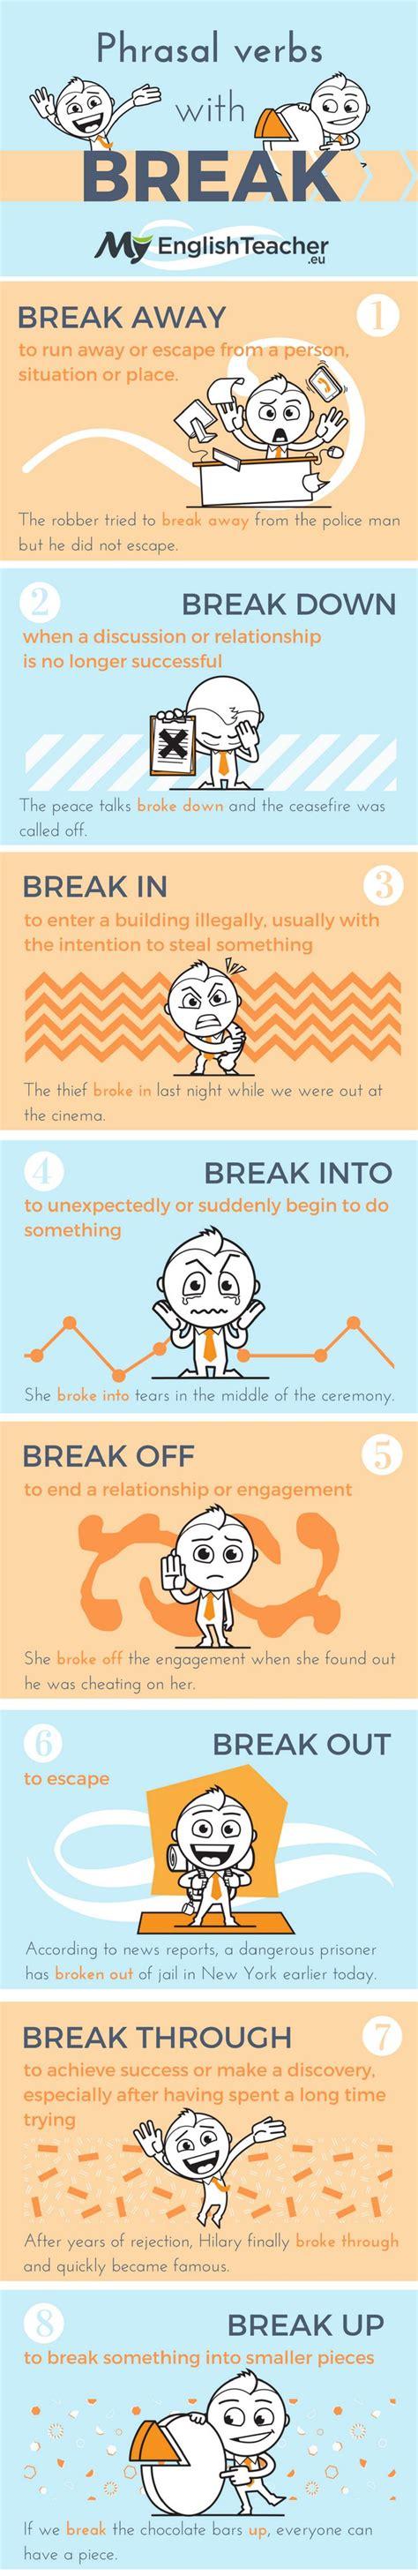 english vinglish themes best 25 english vinglish ideas on pinterest how to